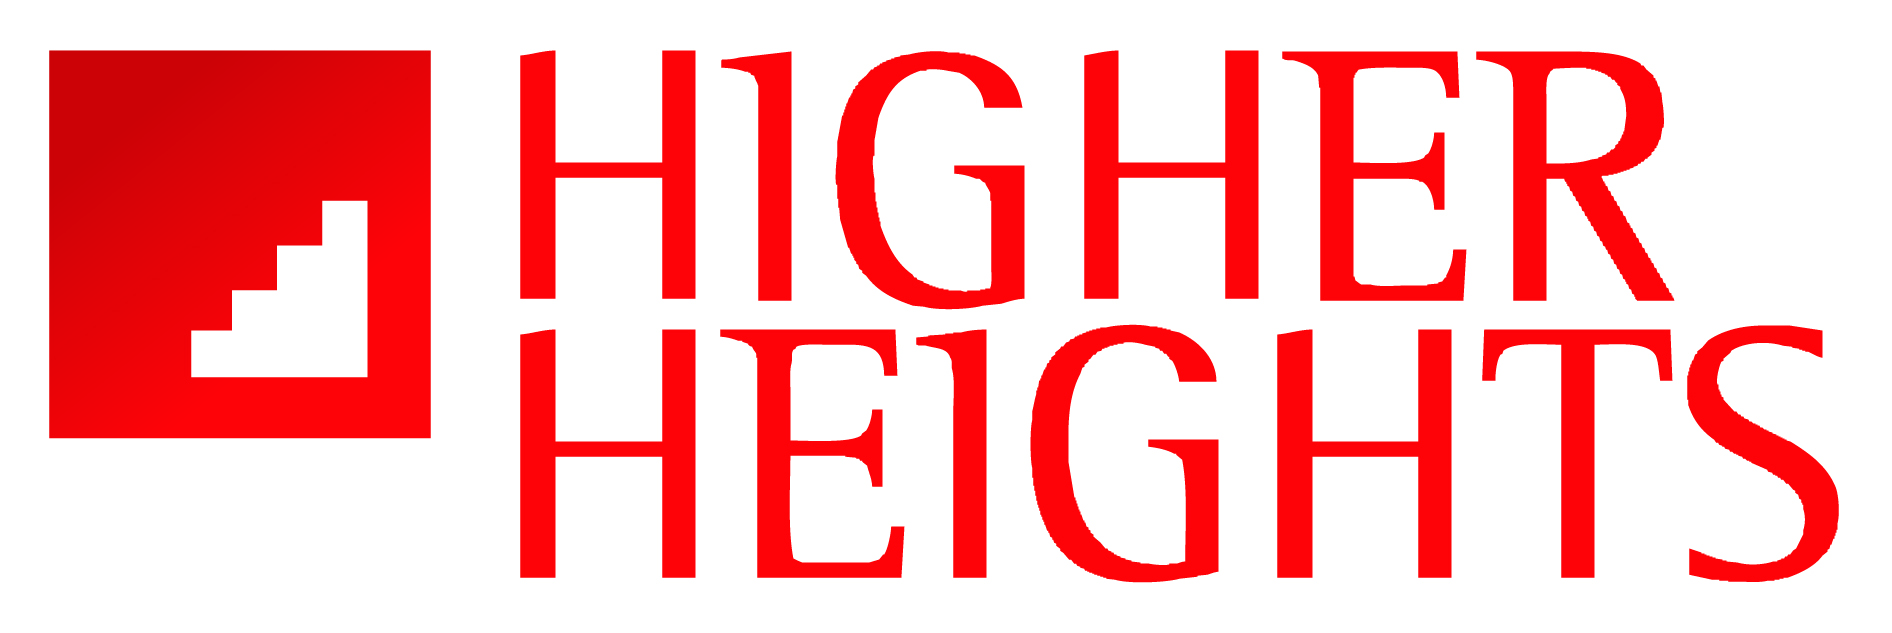 higherheights.jpg